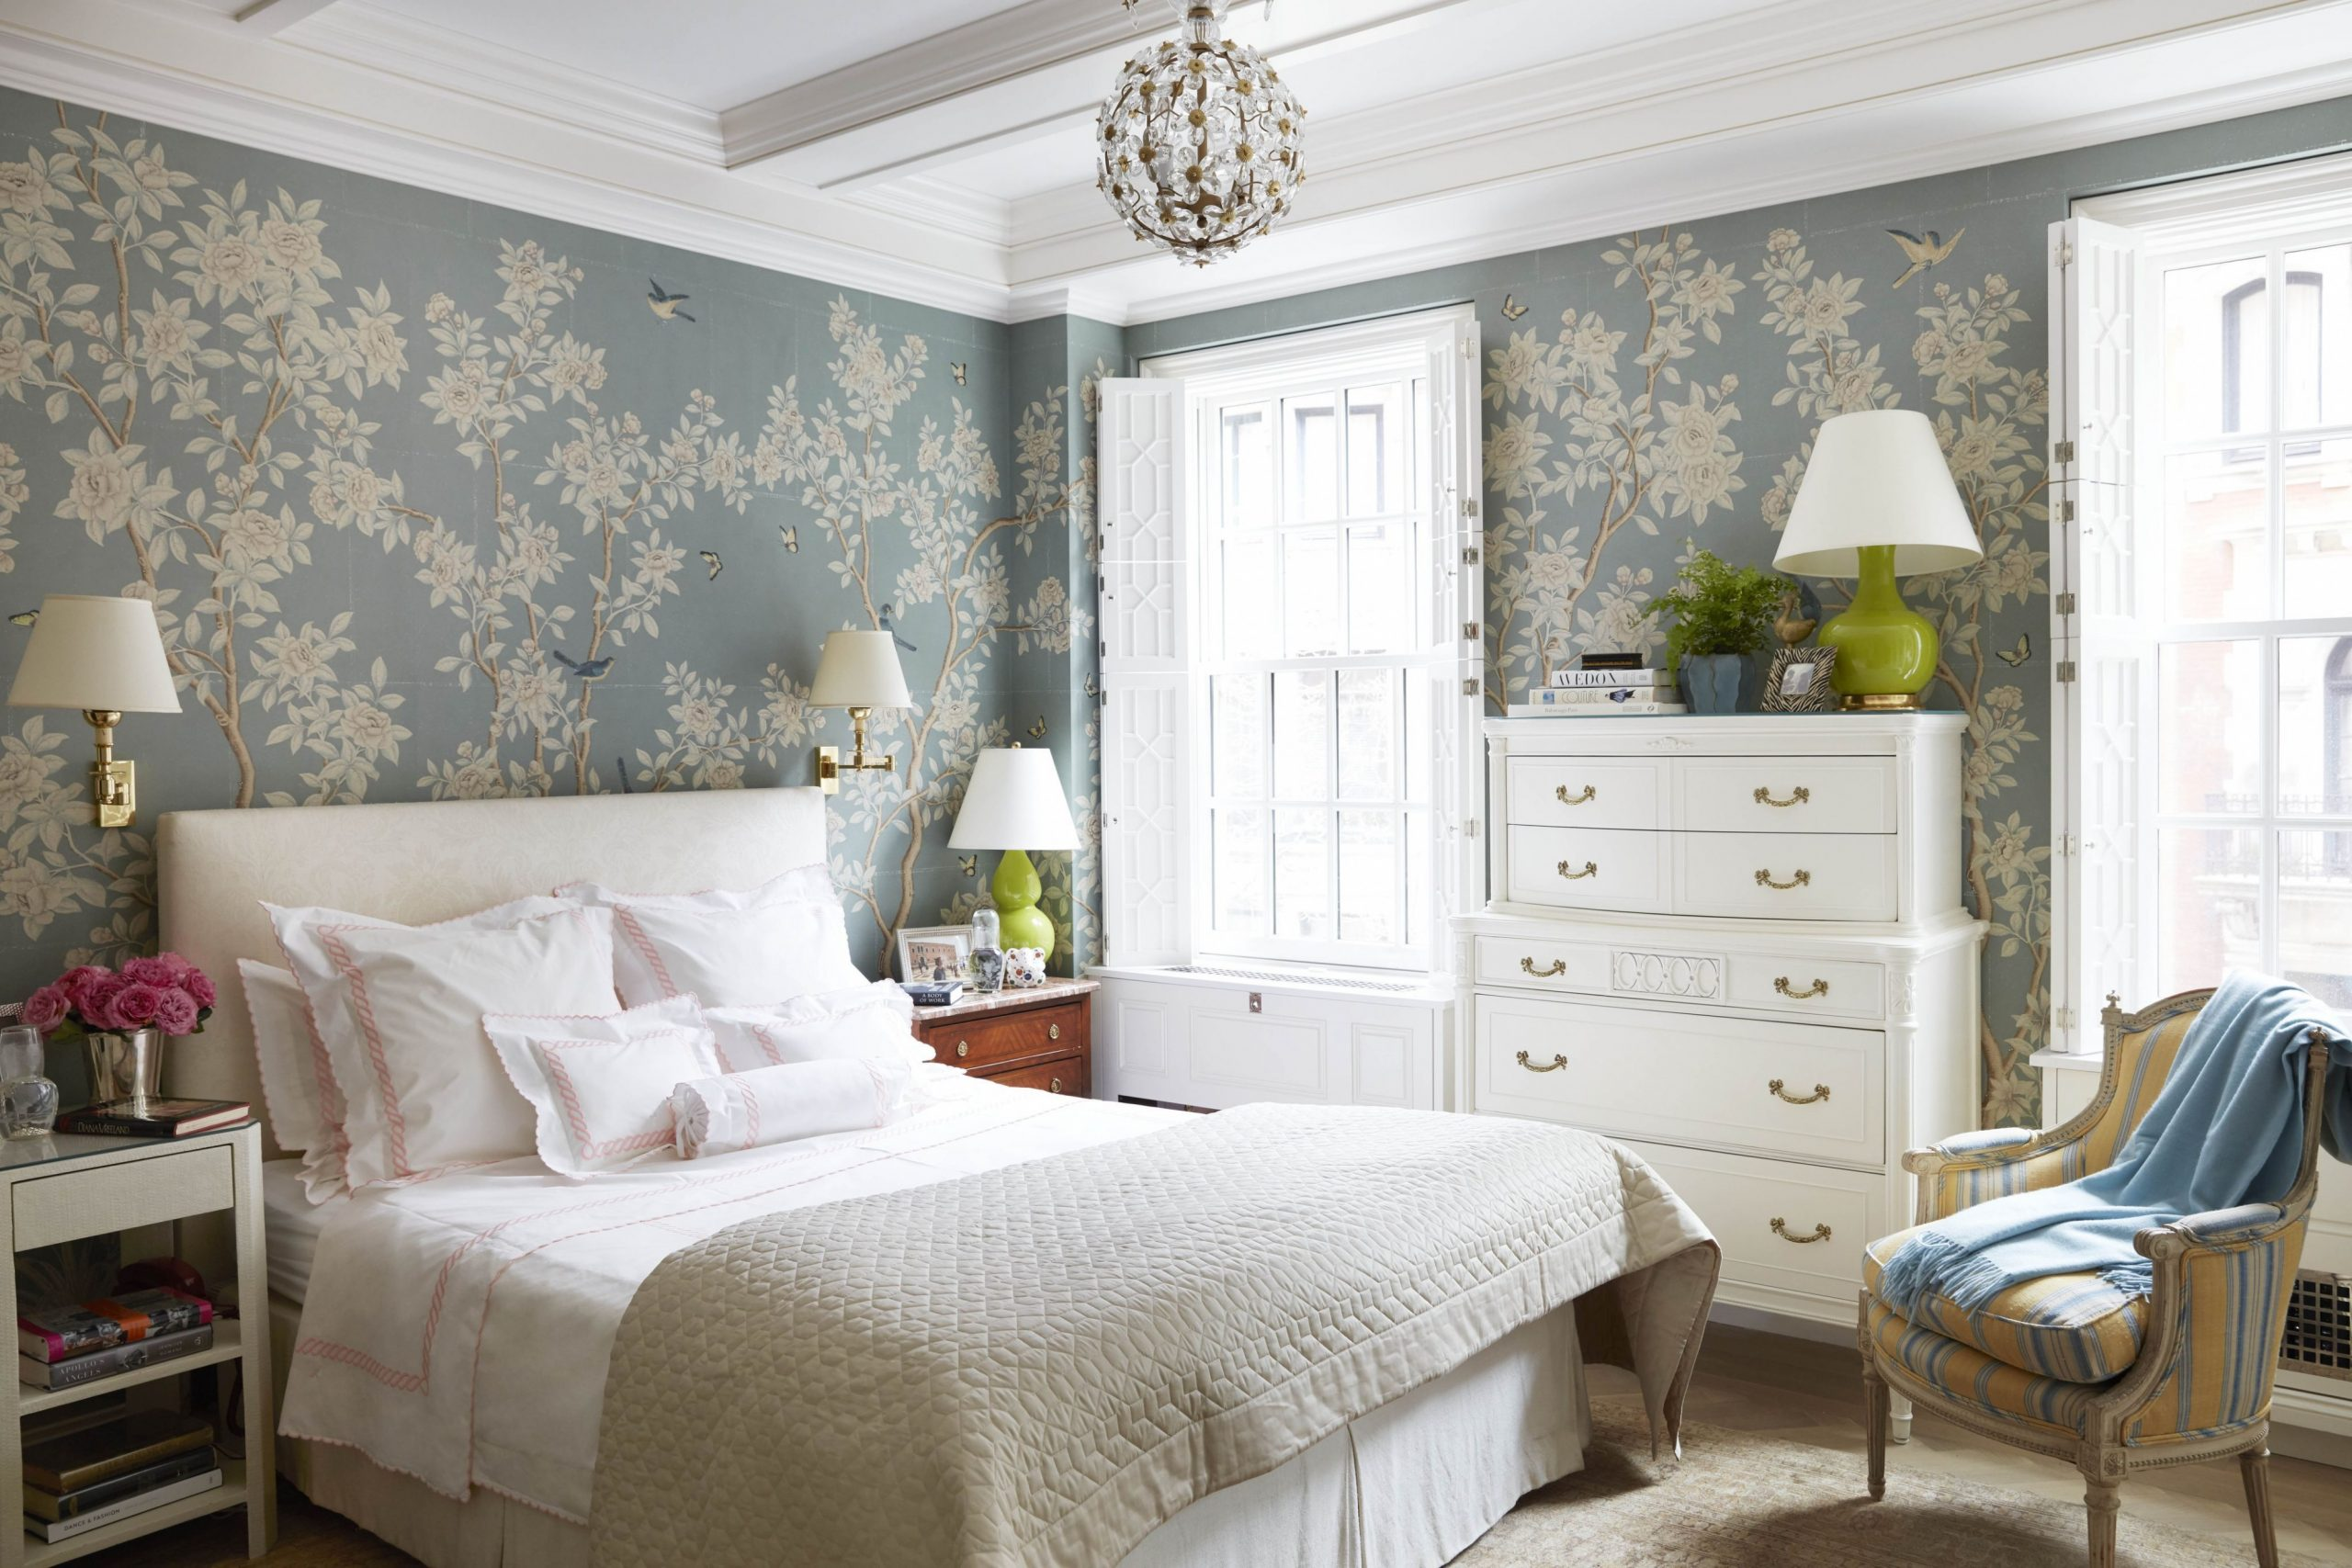 11 Beautiful Bedroom Wallpaper Ideas To Envelop Yourself With  - Bedroom Ideas Wallpaper